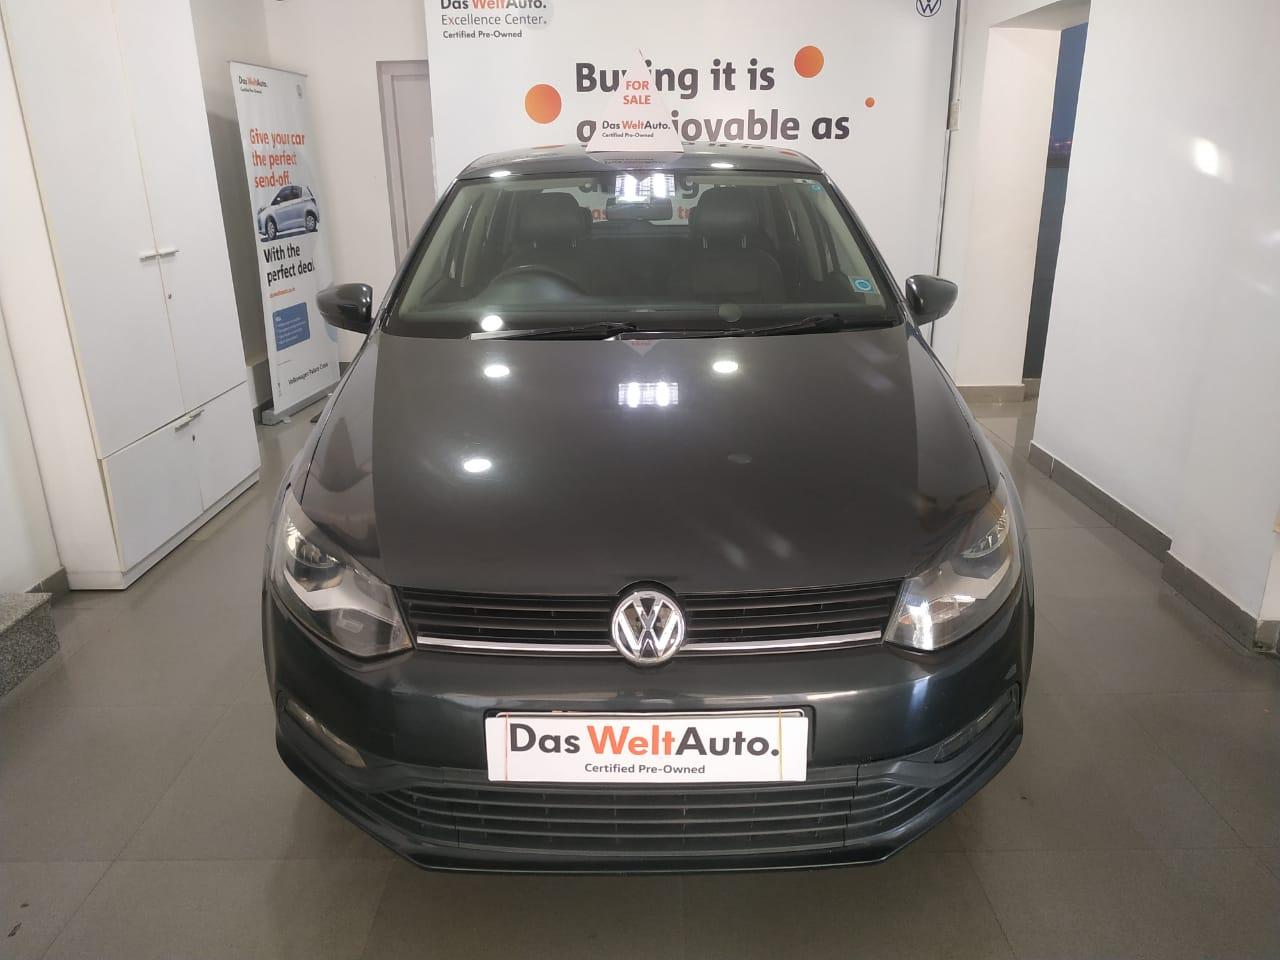 2017 Used Volkswagen Polo(2016-2019) COMFORTLINE 1.2L P